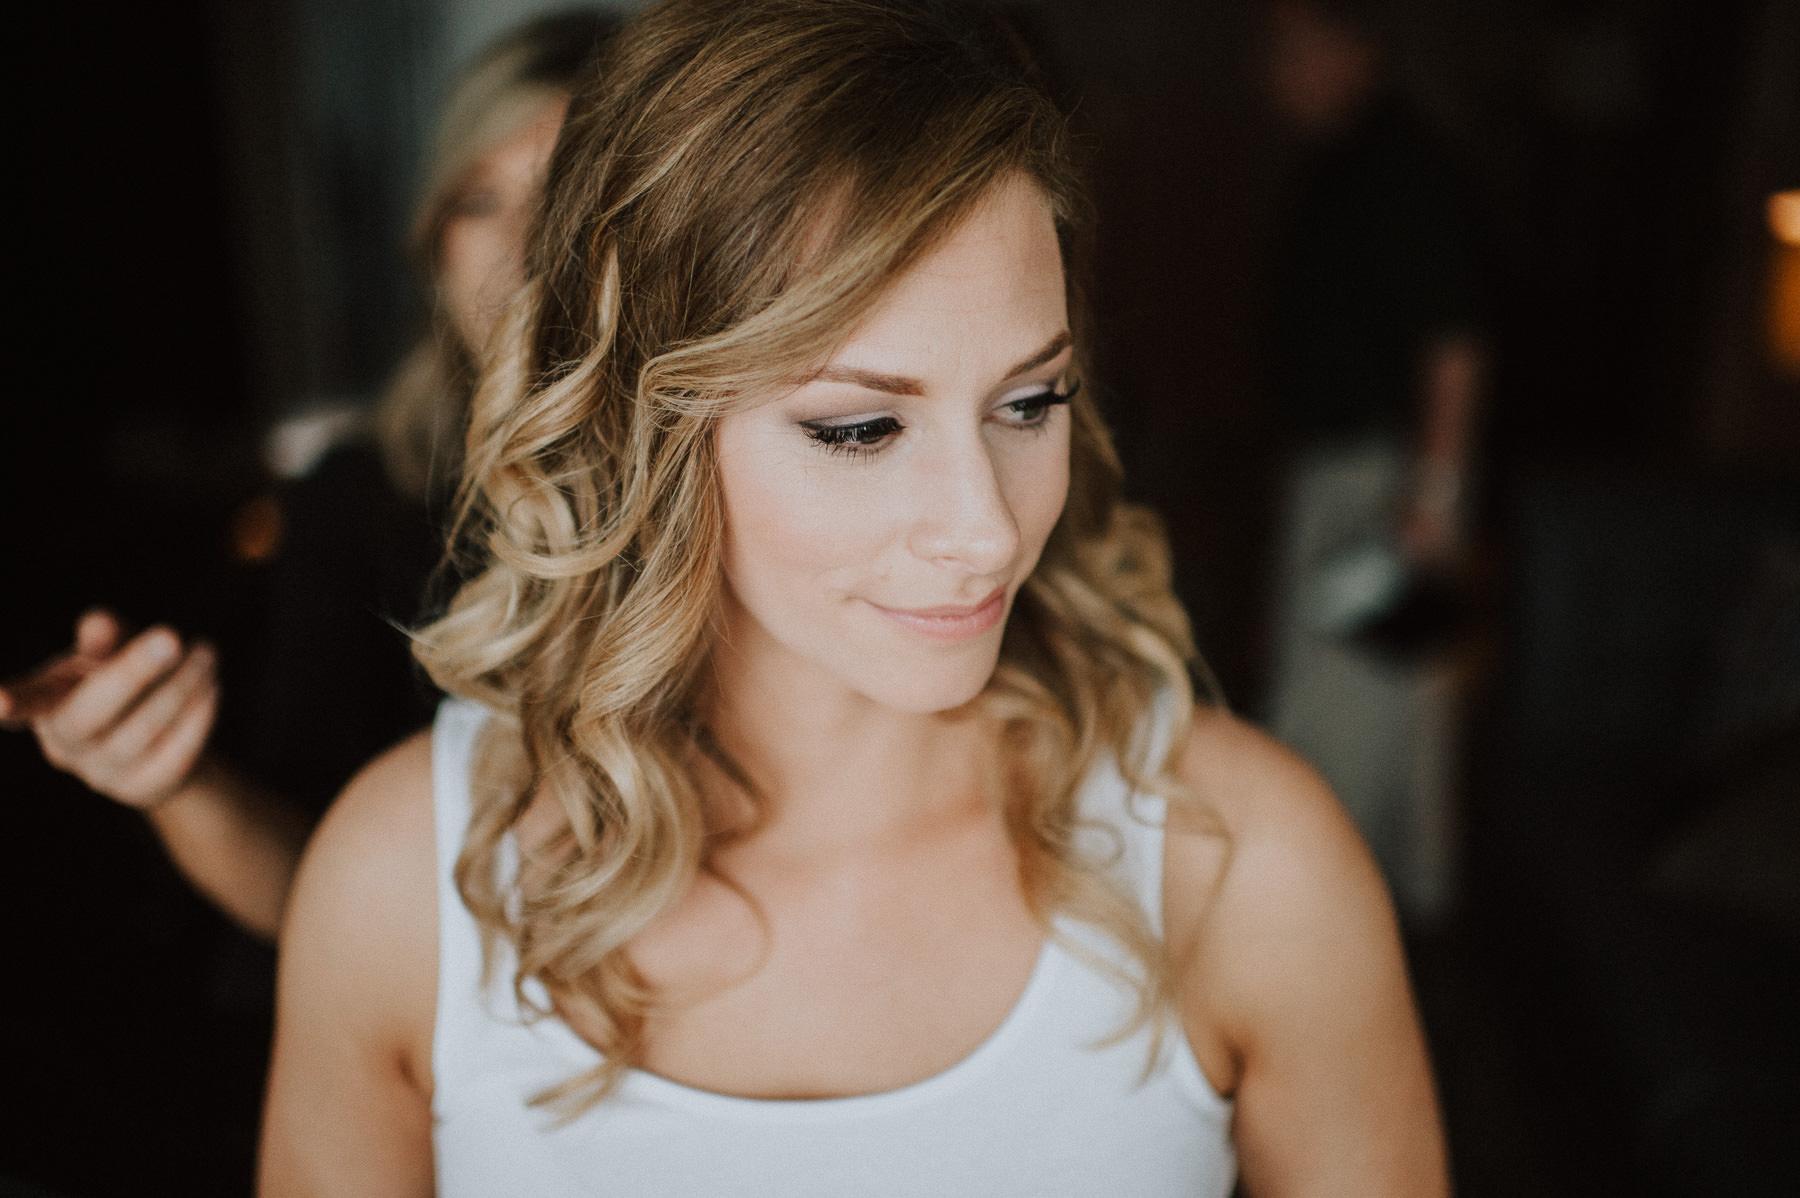 appleford-estate-wedding-photography-7.jpg